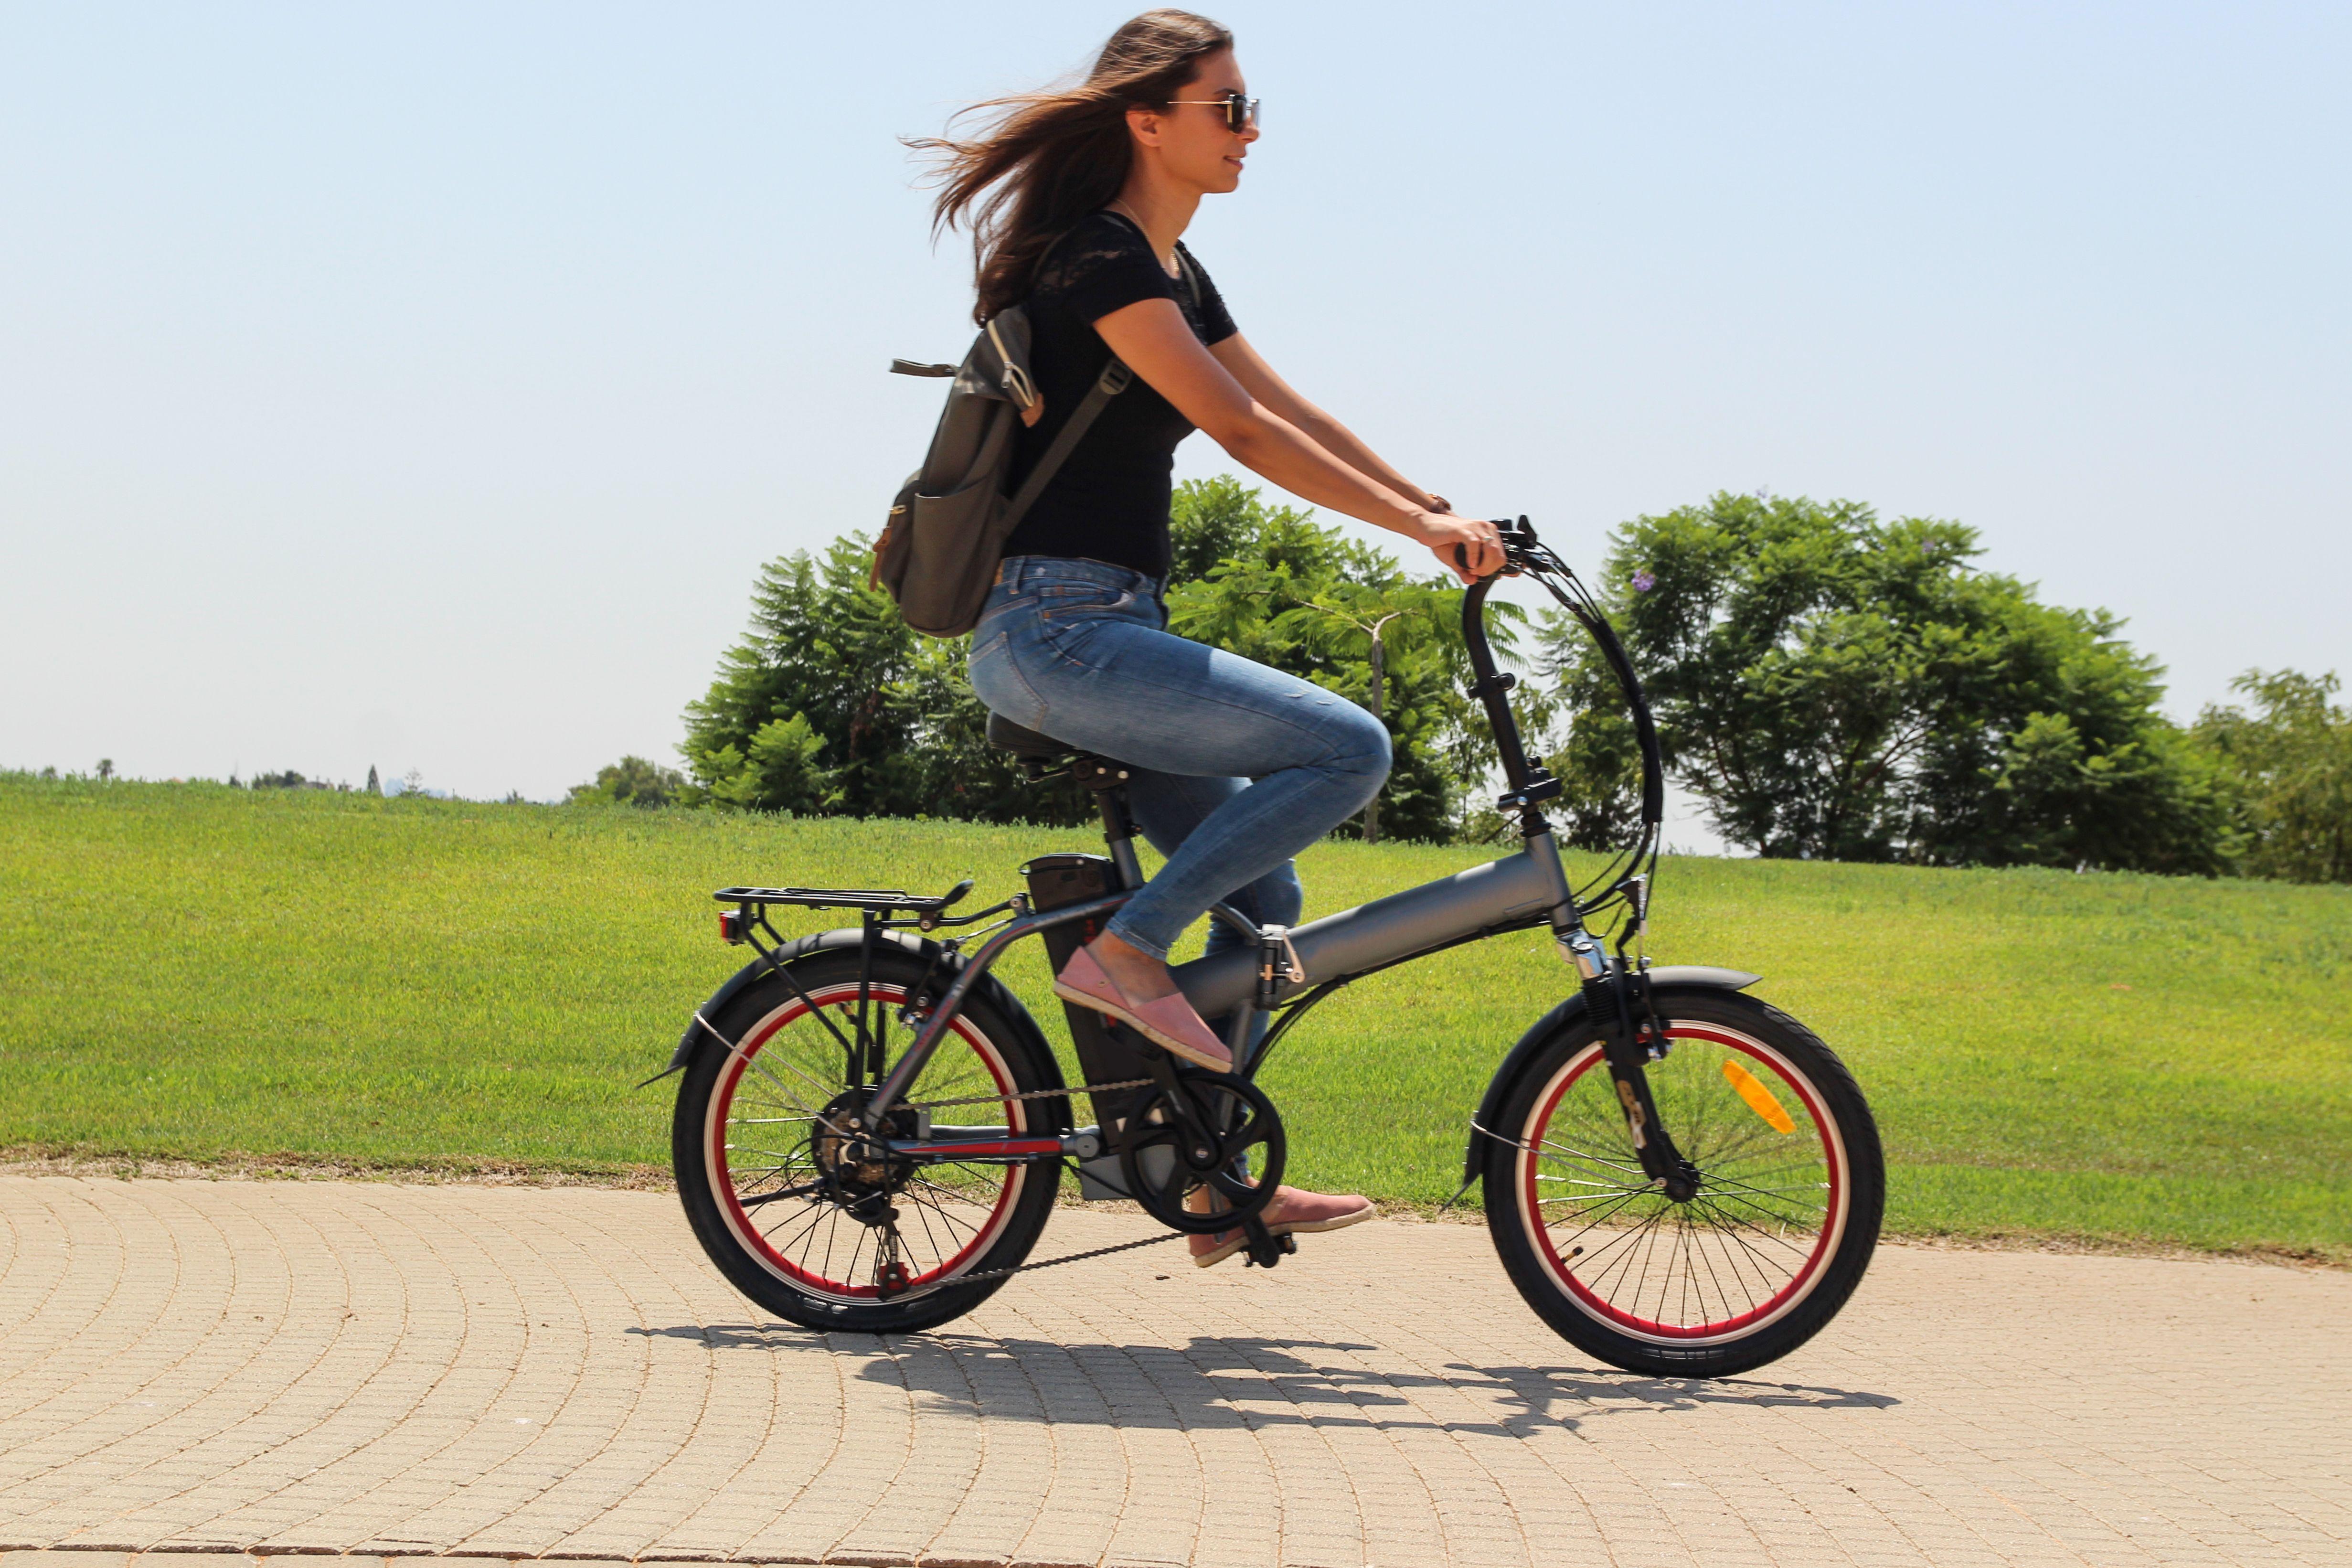 Alquila tu bicicleta eléctrica en Al Rent